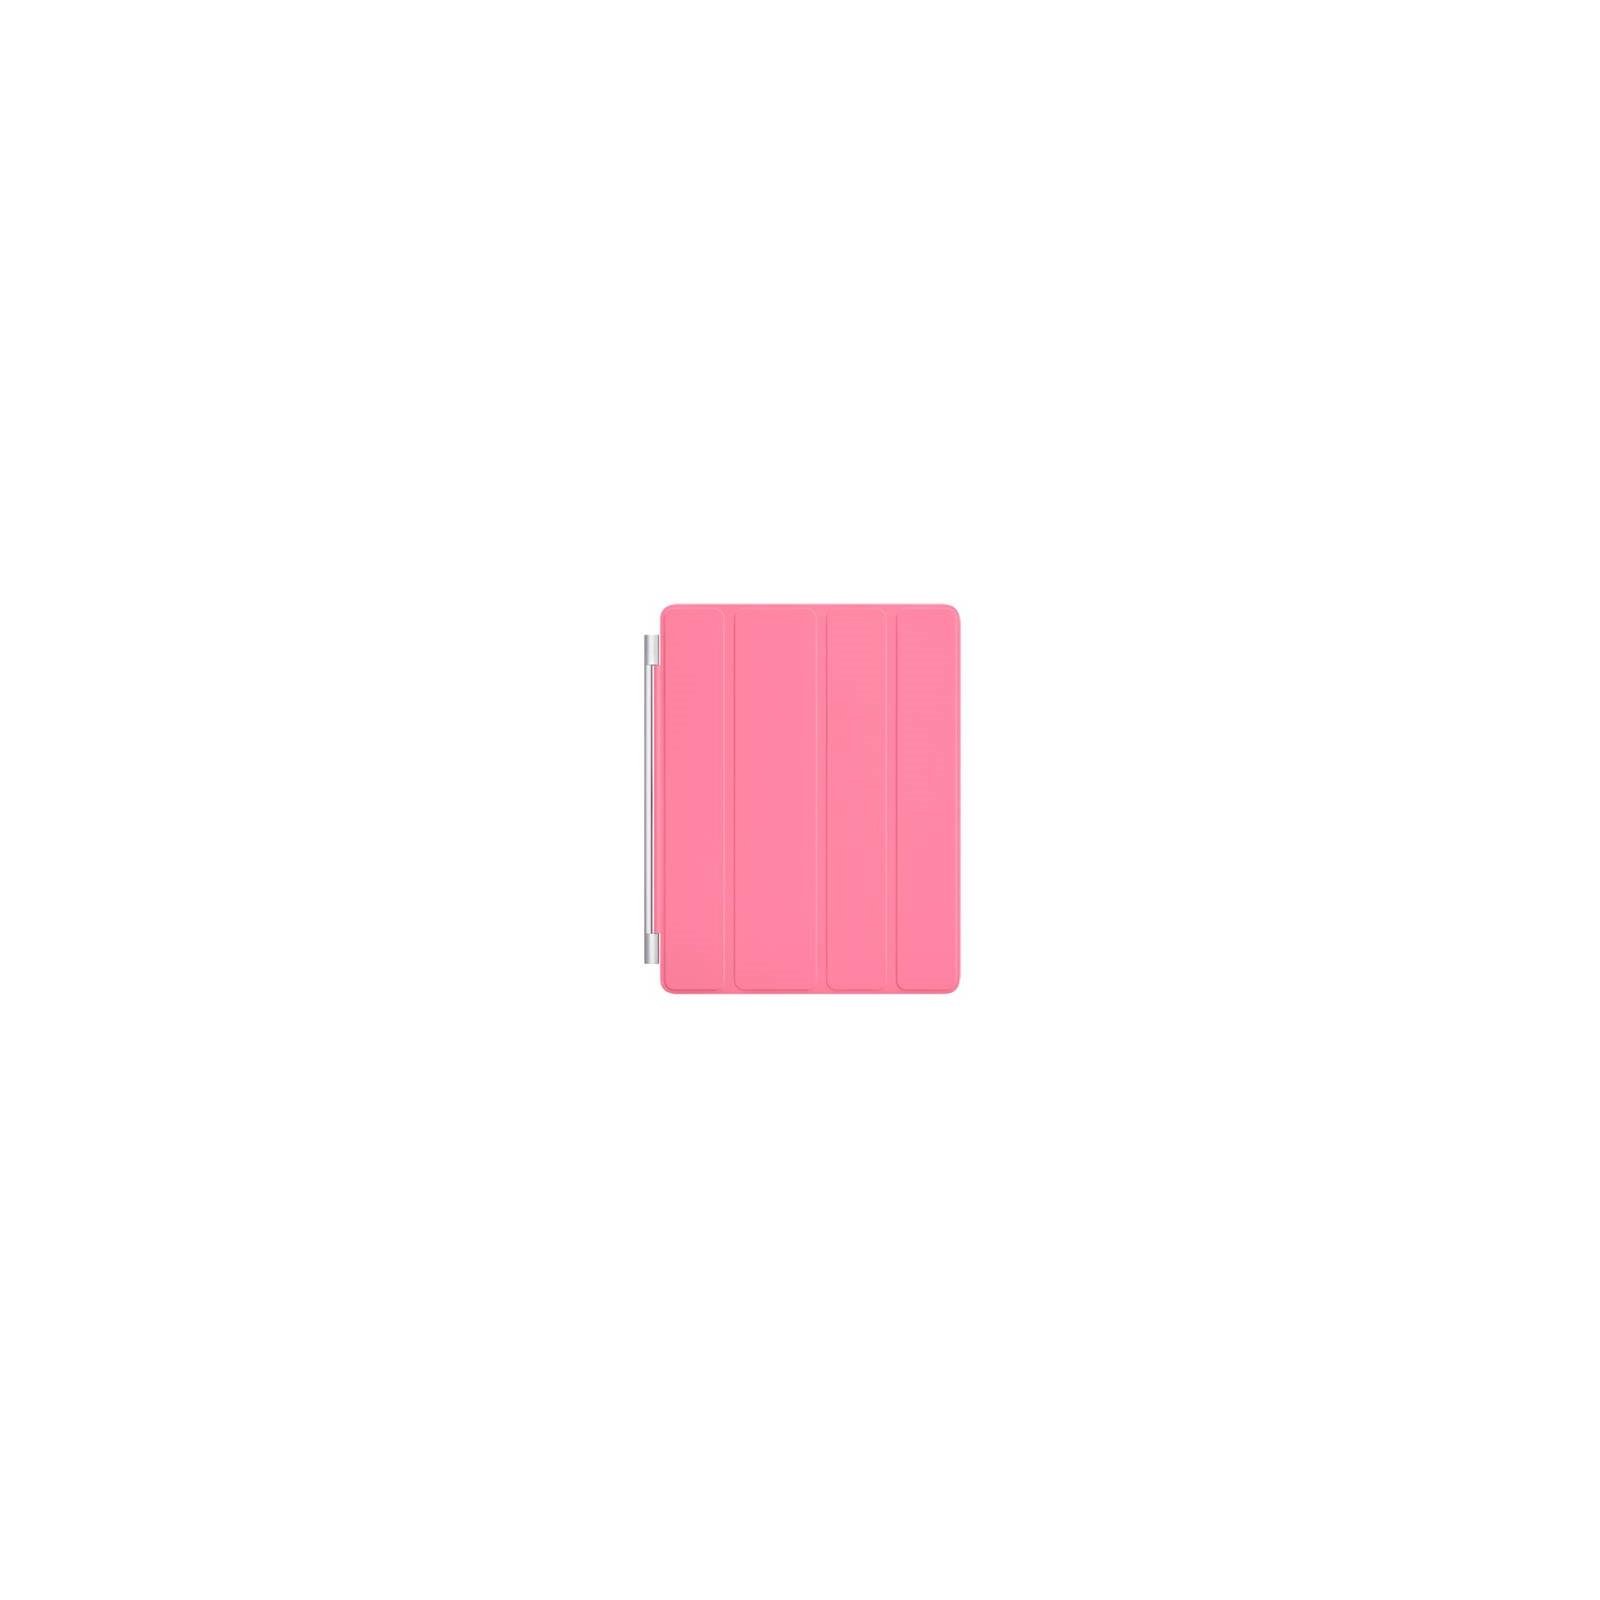 Чехол для планшета Apple Smart Cover для iPad (pink) (MD308ZM/A)